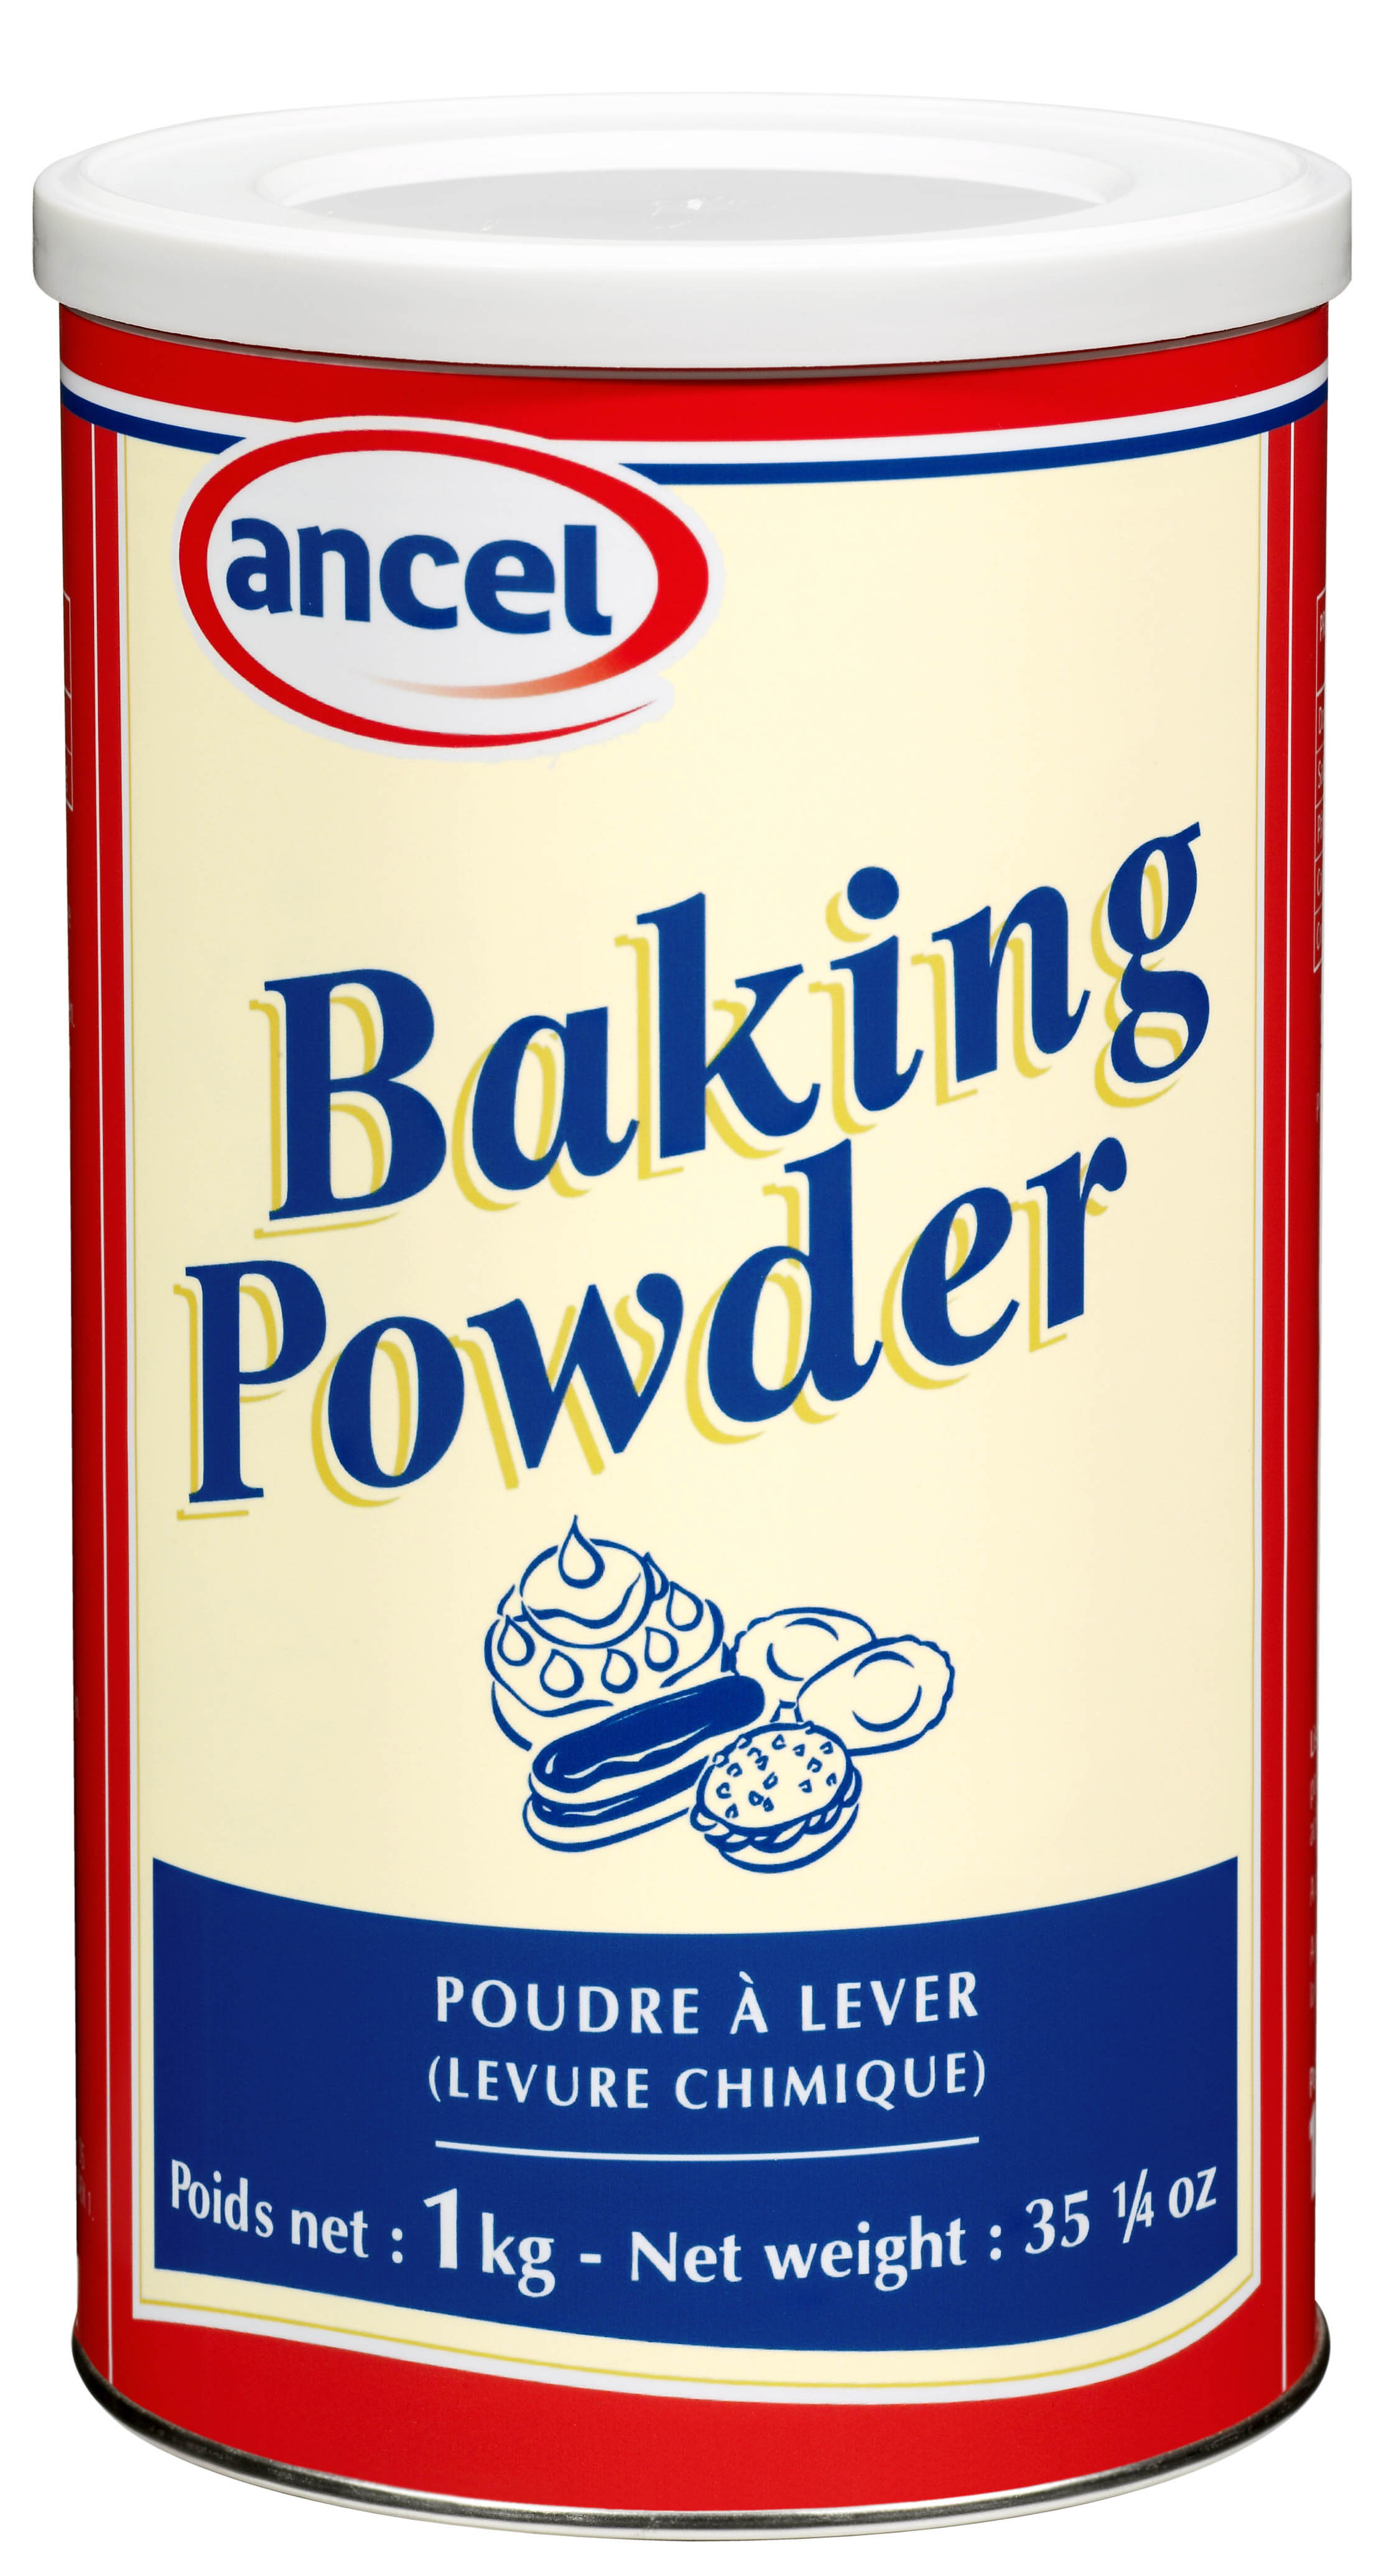 Baking clipart baking powder Pictures clipart baking (31+) levure